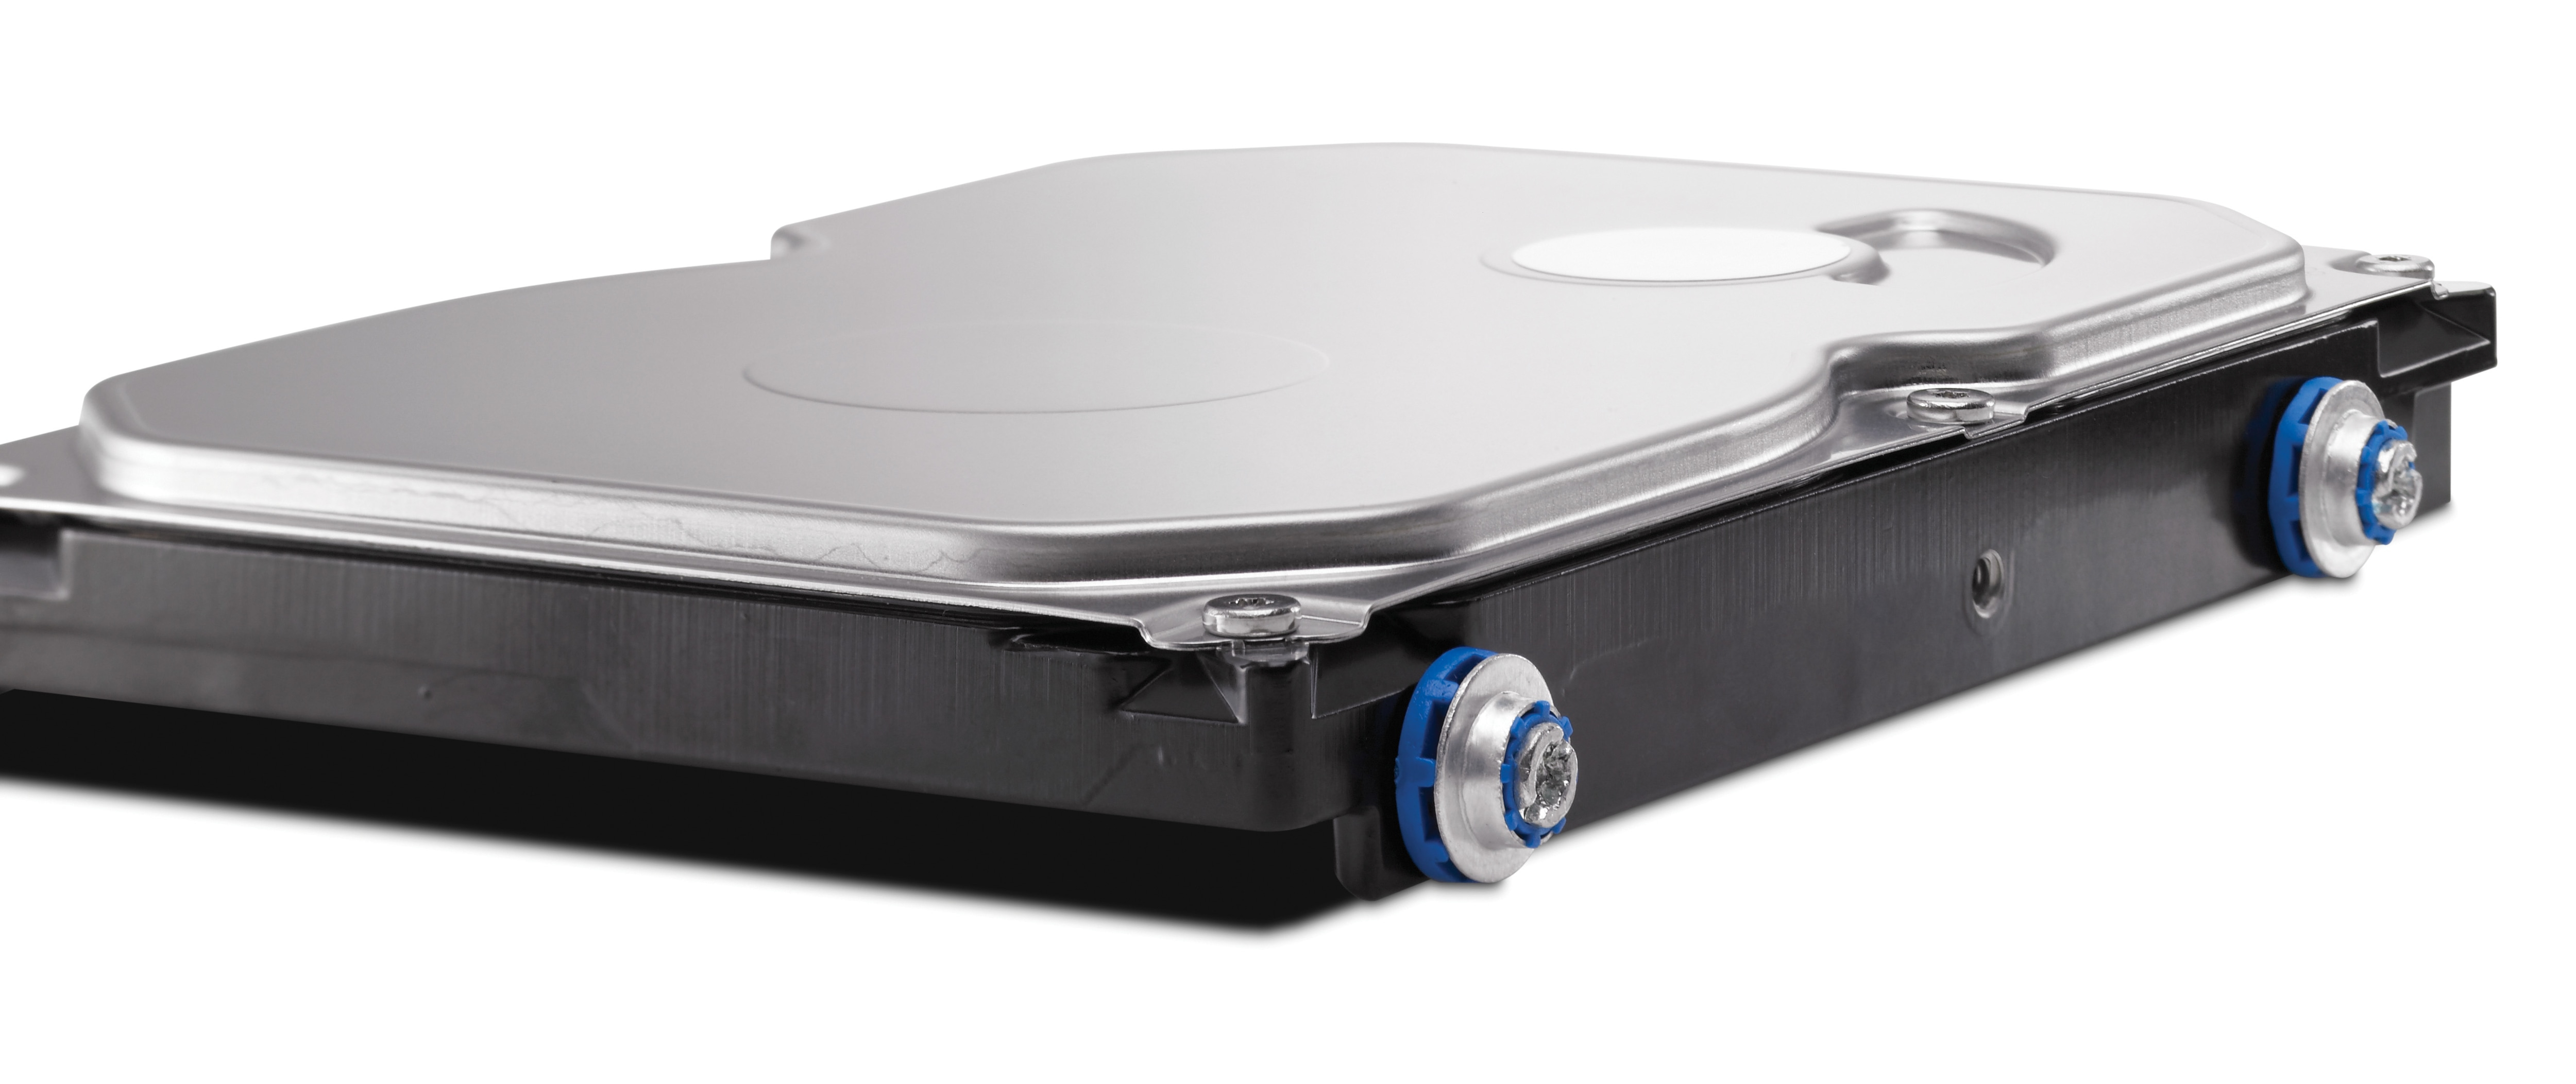 SSD 480 GB, 2.5, 535 MB//s, 6 Gbit//s SSD Hewlett Packard Enterprise P09712-B21 Solid State Drive 2.5 480 GB Serial ATA III MLC Interne Solid State Drives